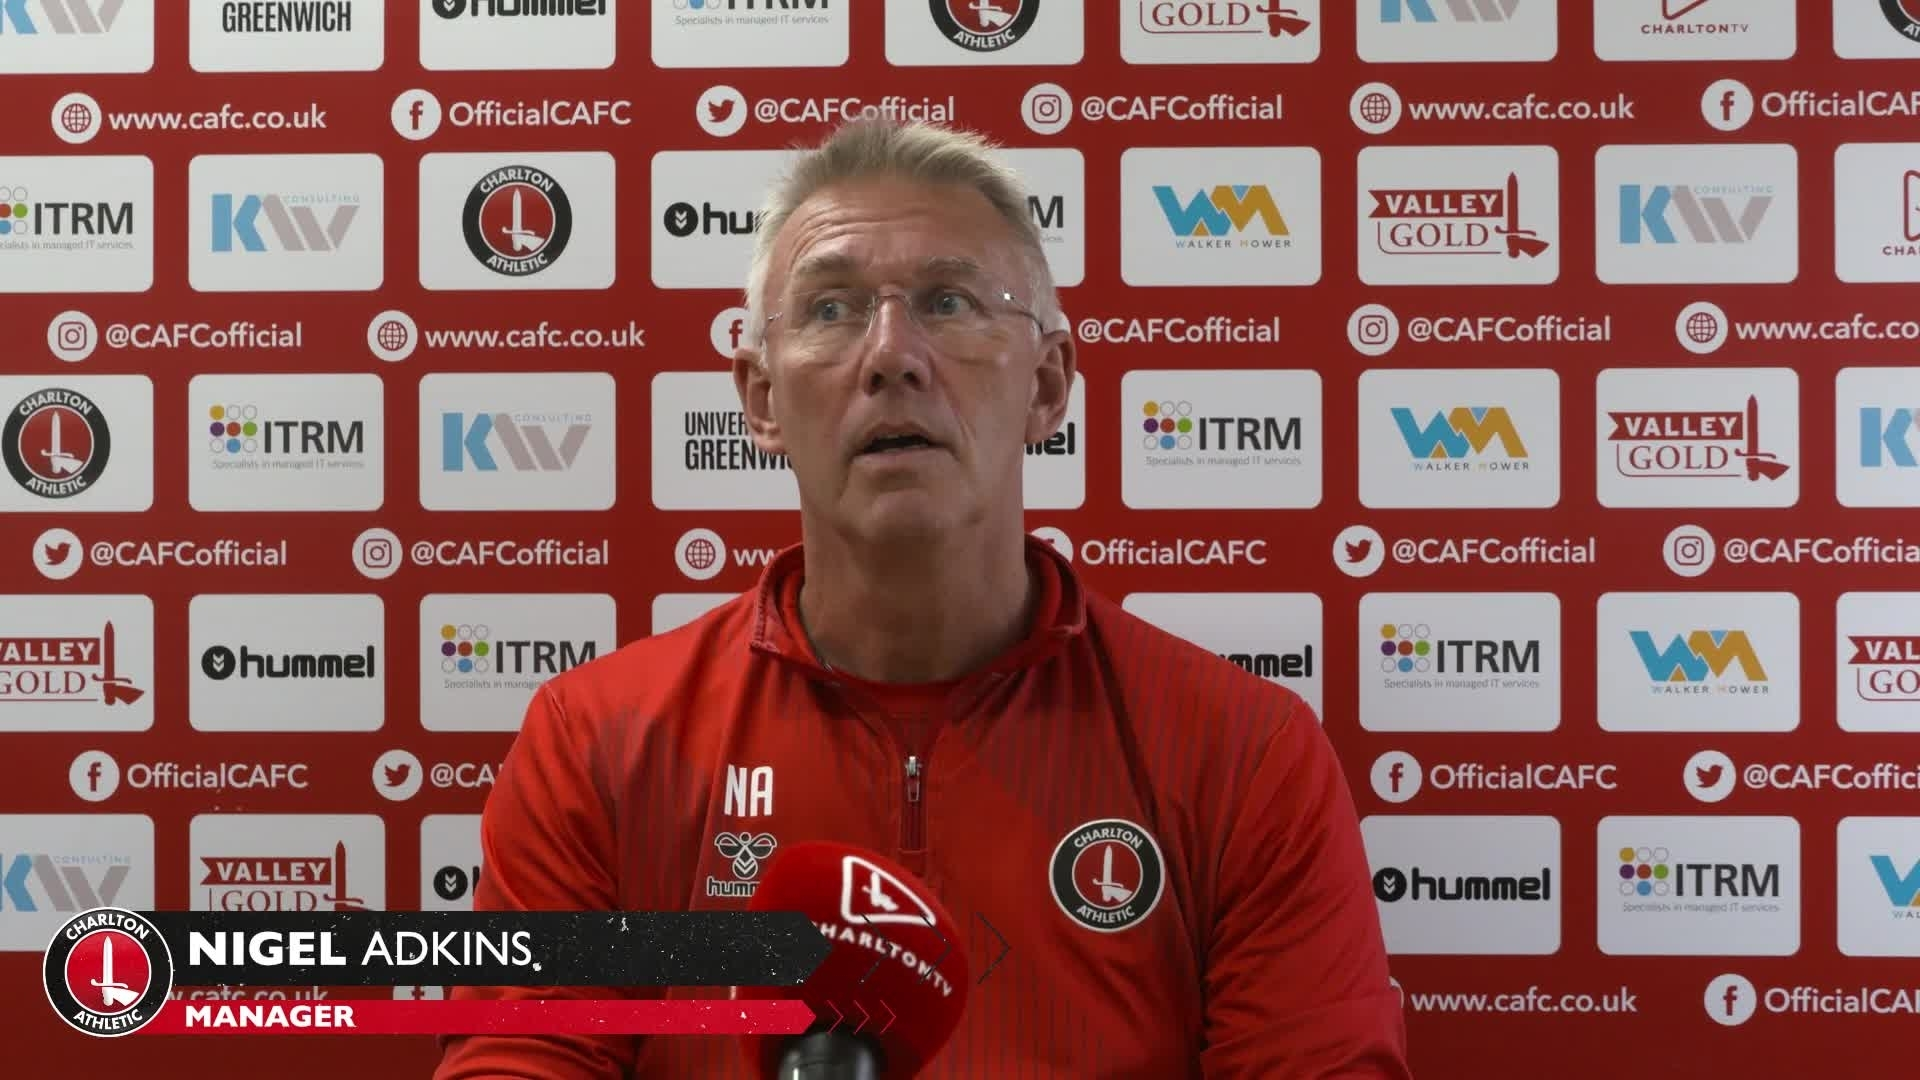 Nigel Adkins' pre-Cheltenham press conference (September 2021)